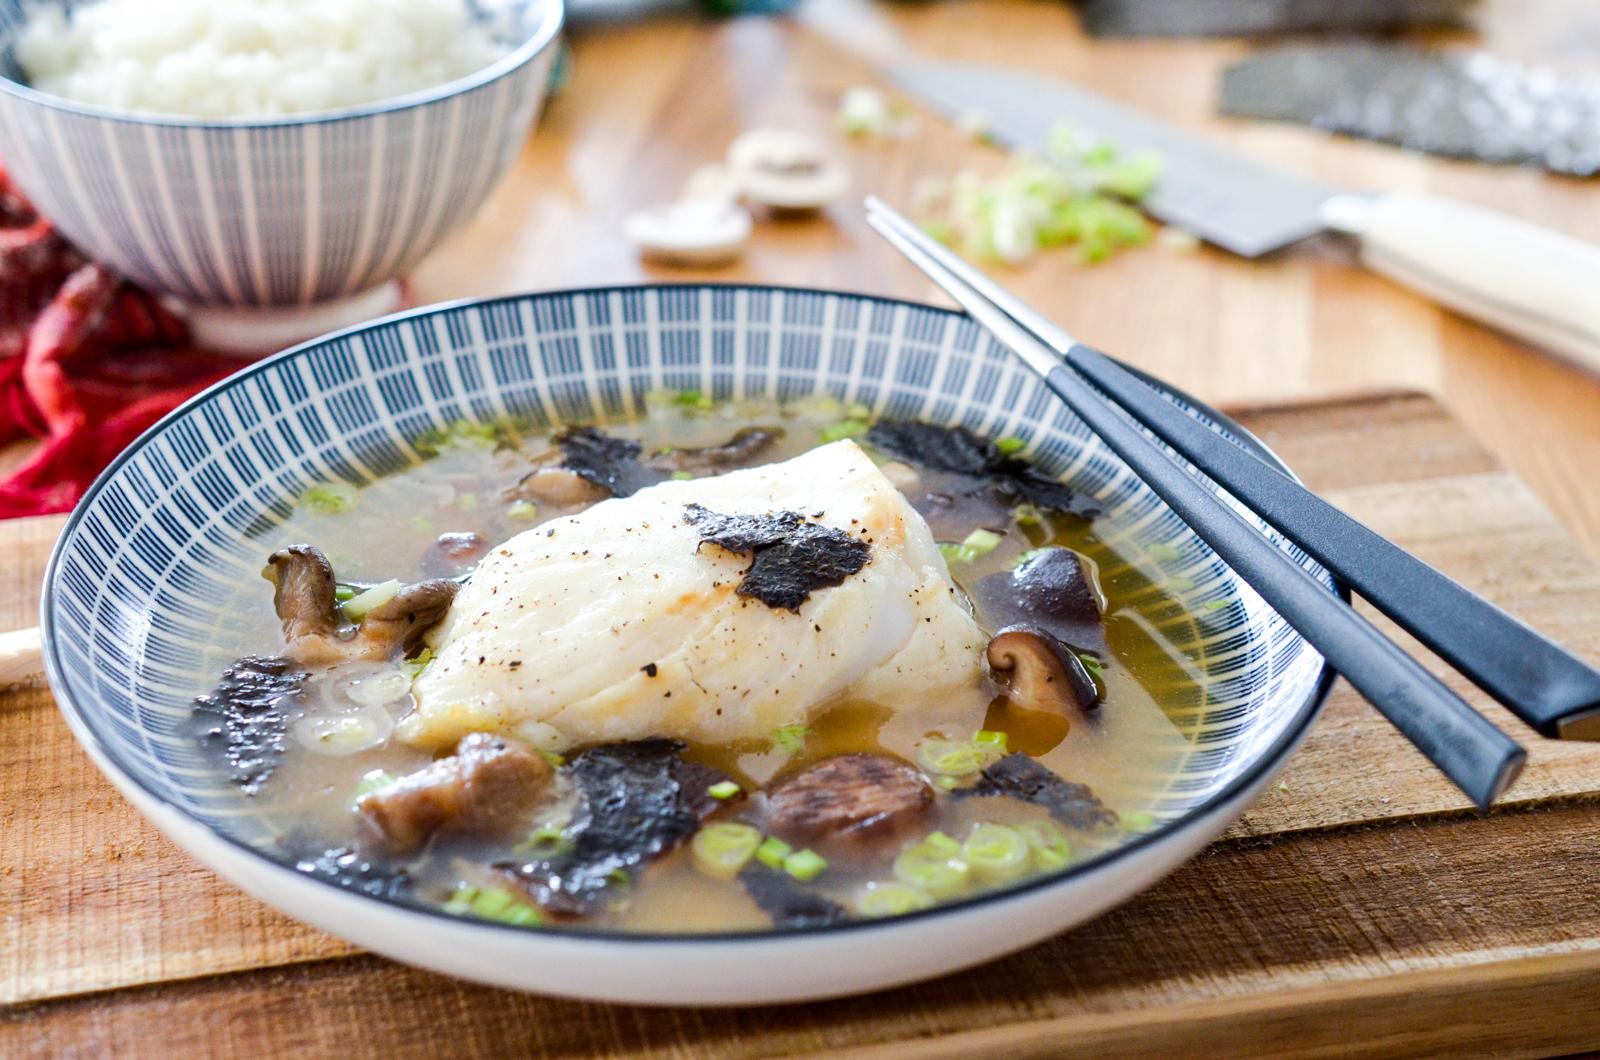 Dos de cabillaud au bouillon miso et shiitake